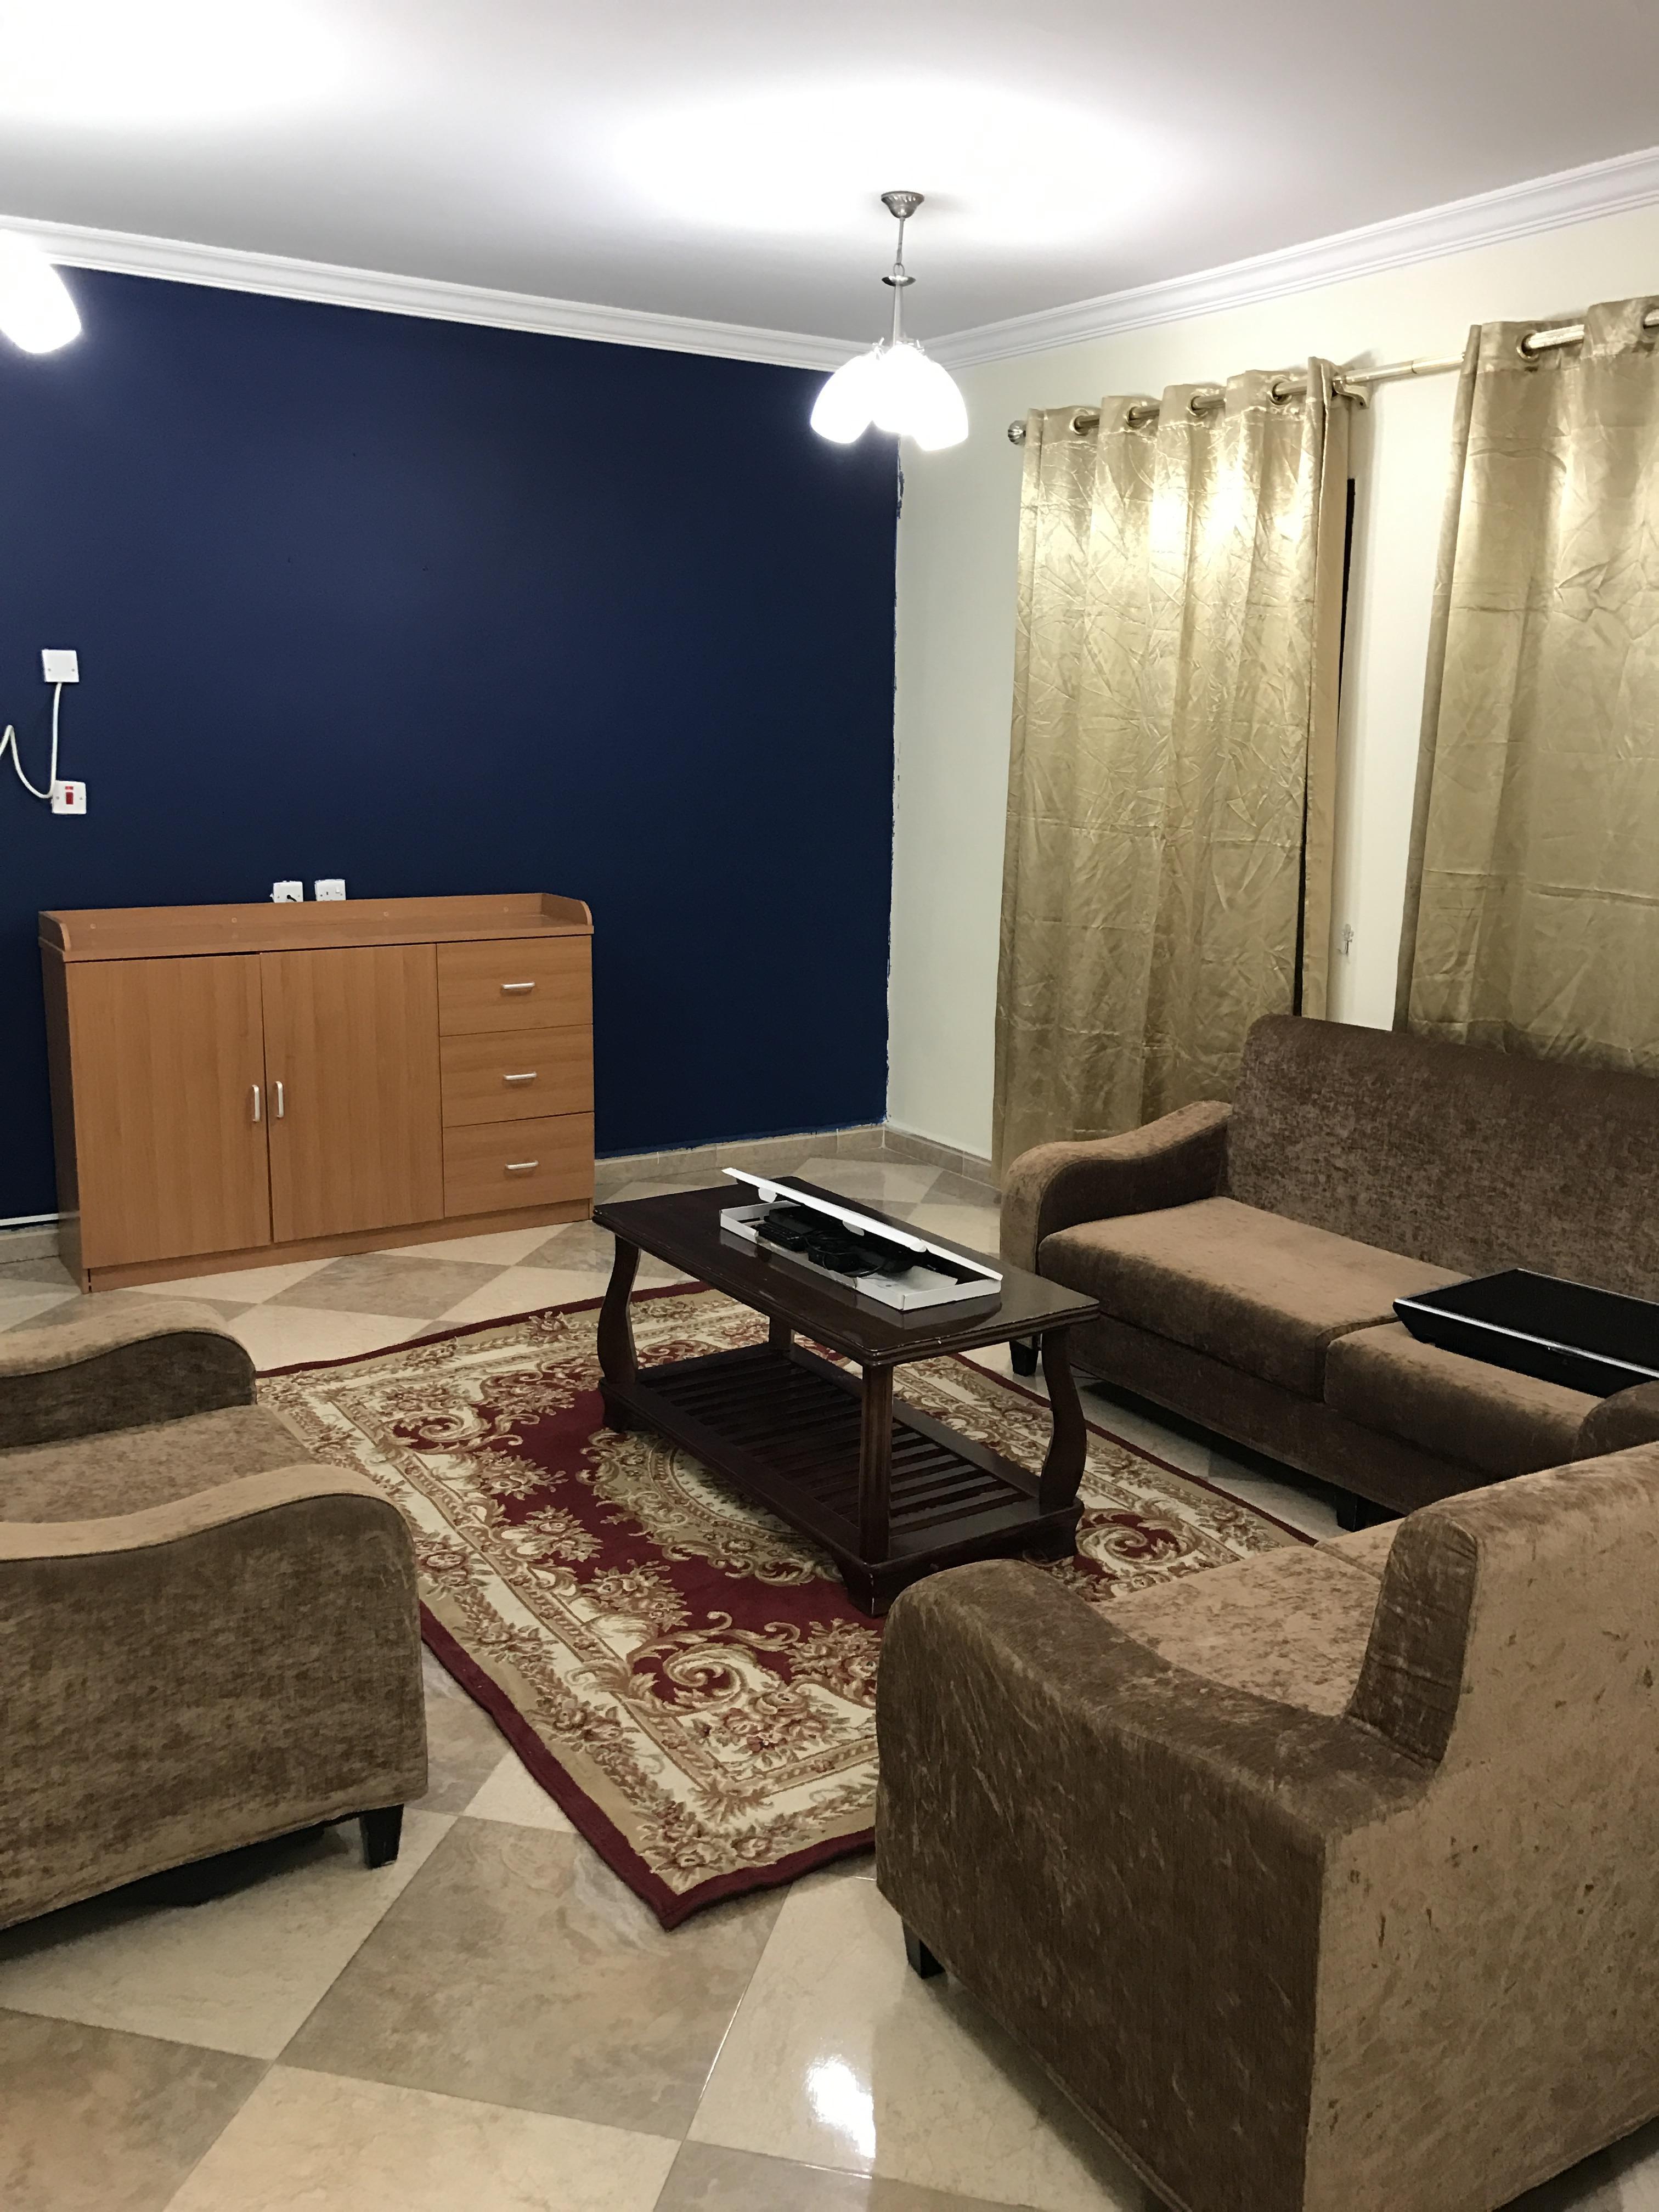 Fully furnished flat for rent شقة مفروشة لاليجار